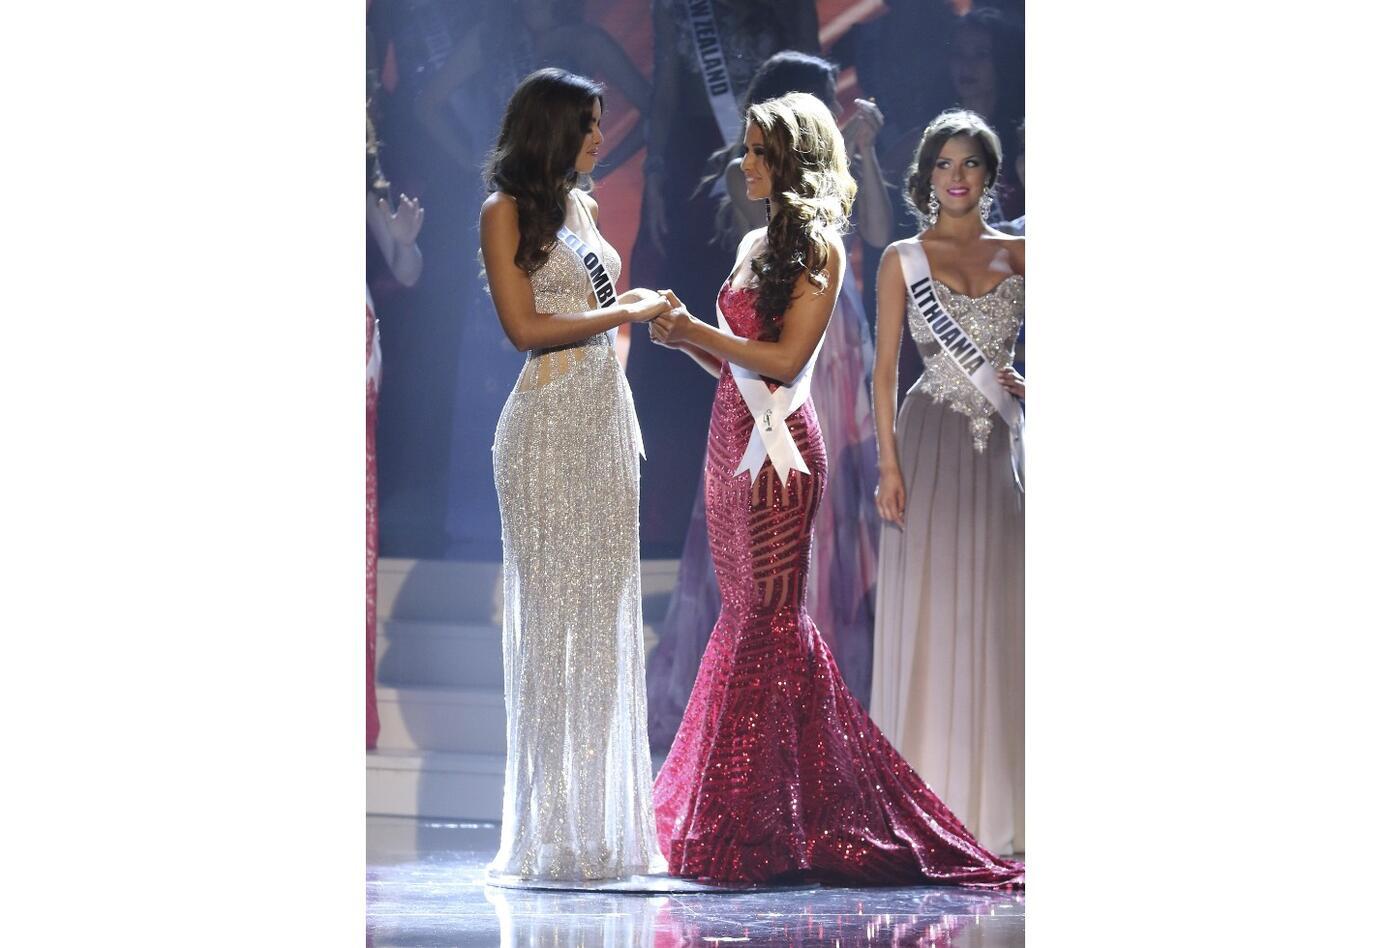 Paulina Vega en Miss Universo en 2015 junto a Miss USA